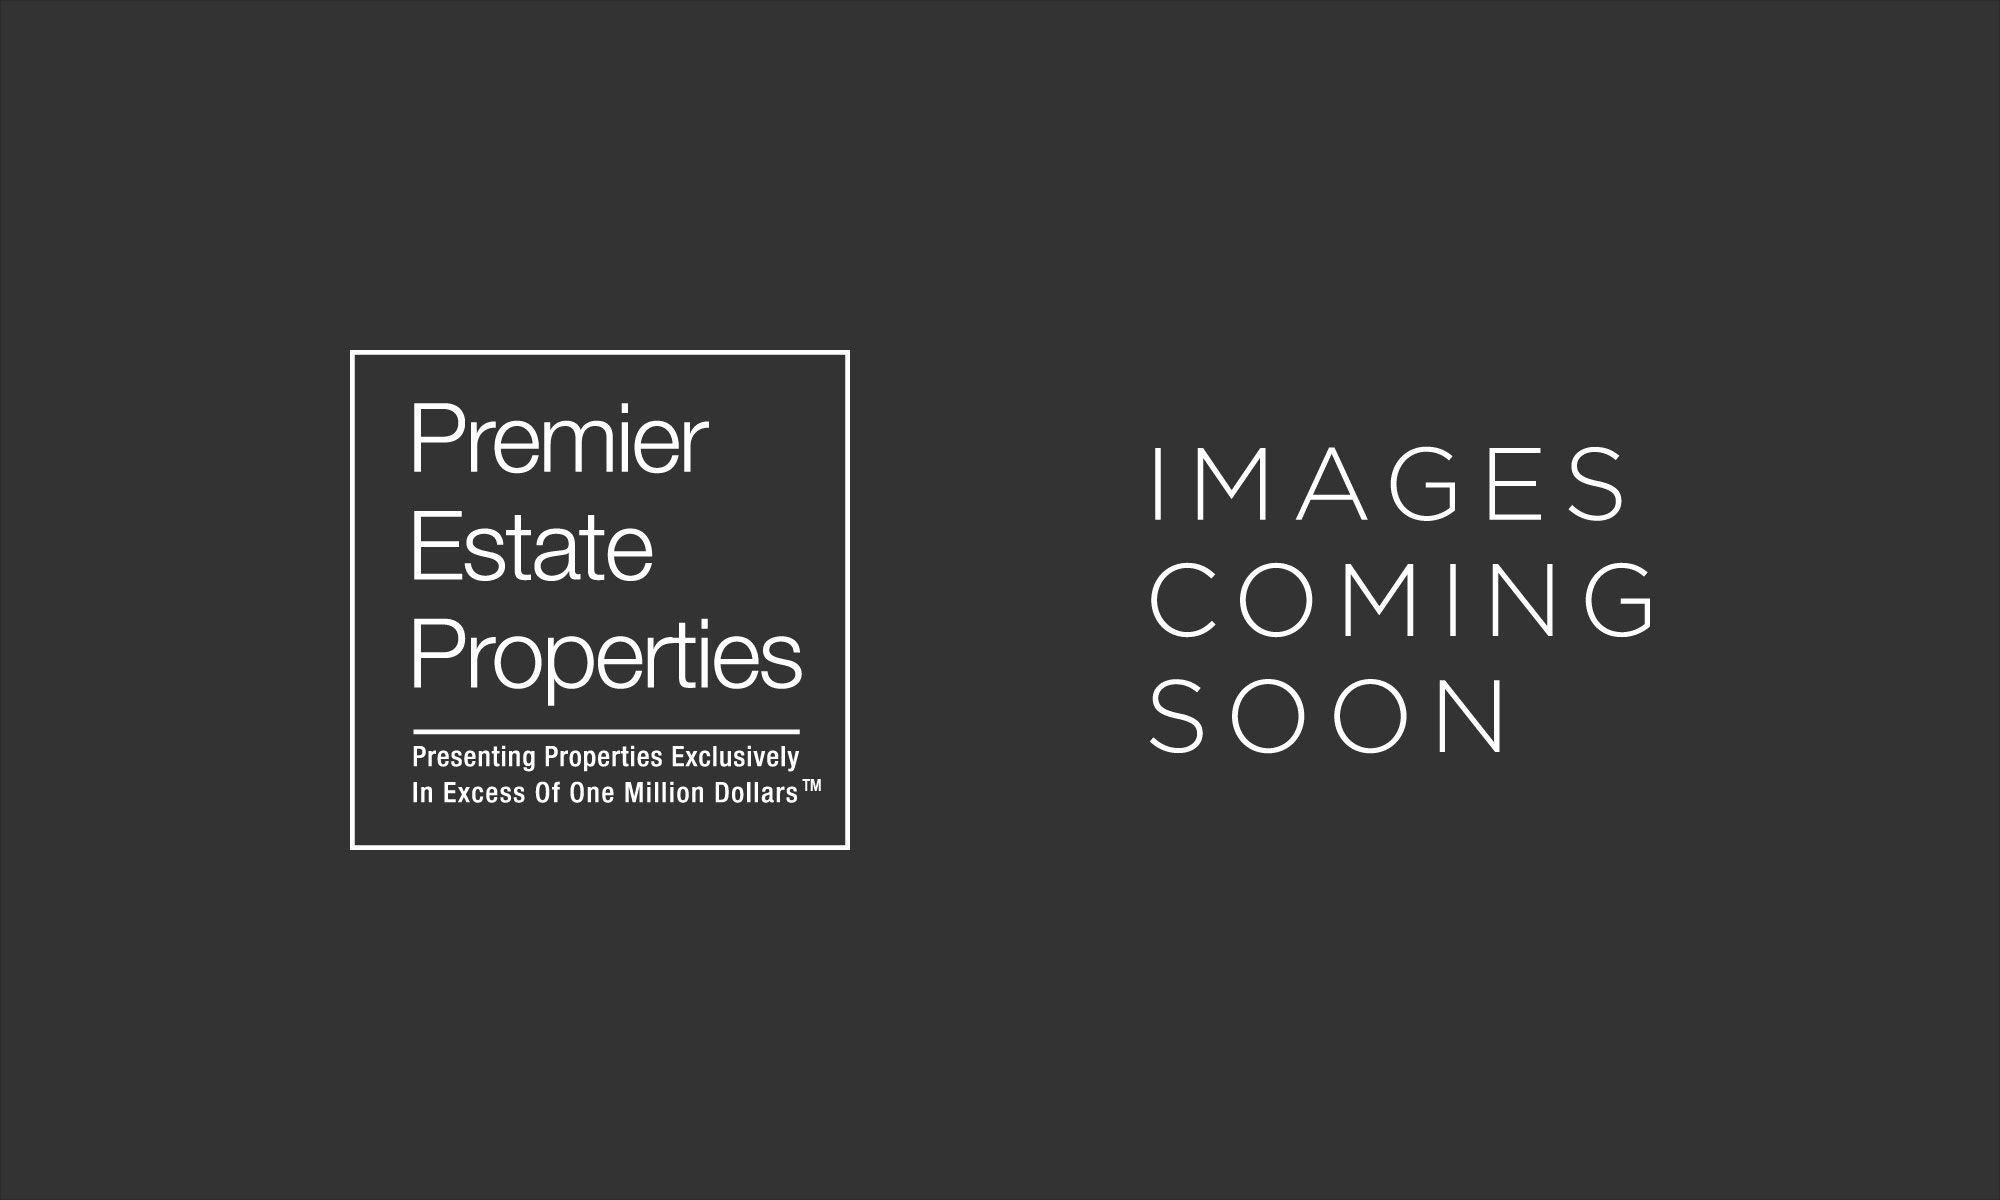 Single Family Home for Sale at 1040 S Ocean Boulevard 1040 S Ocean Boulevard Manalapan, Florida 33462 United States